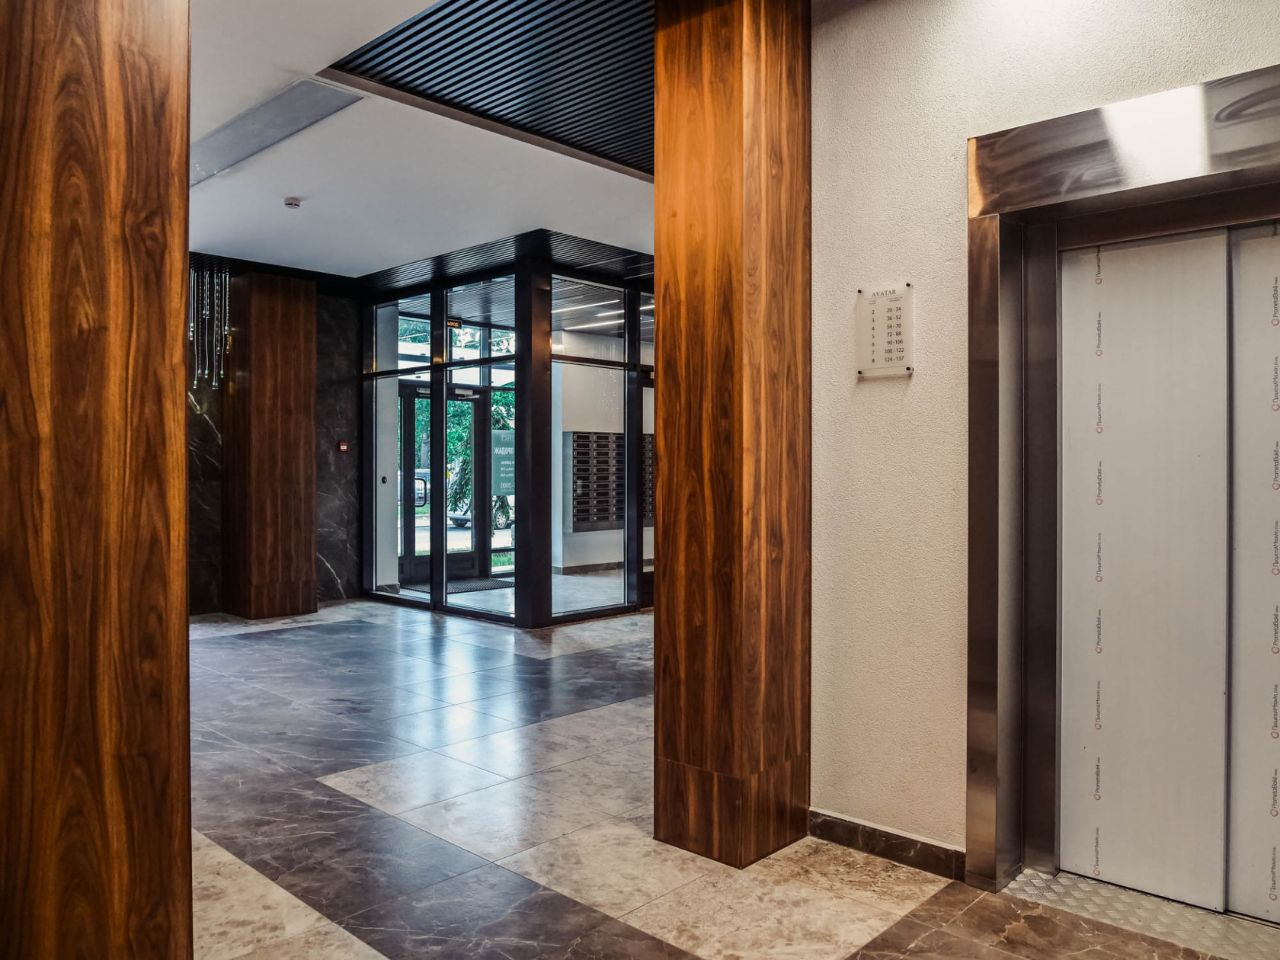 ЖК Апарт-отель AVATAR (Аватар)